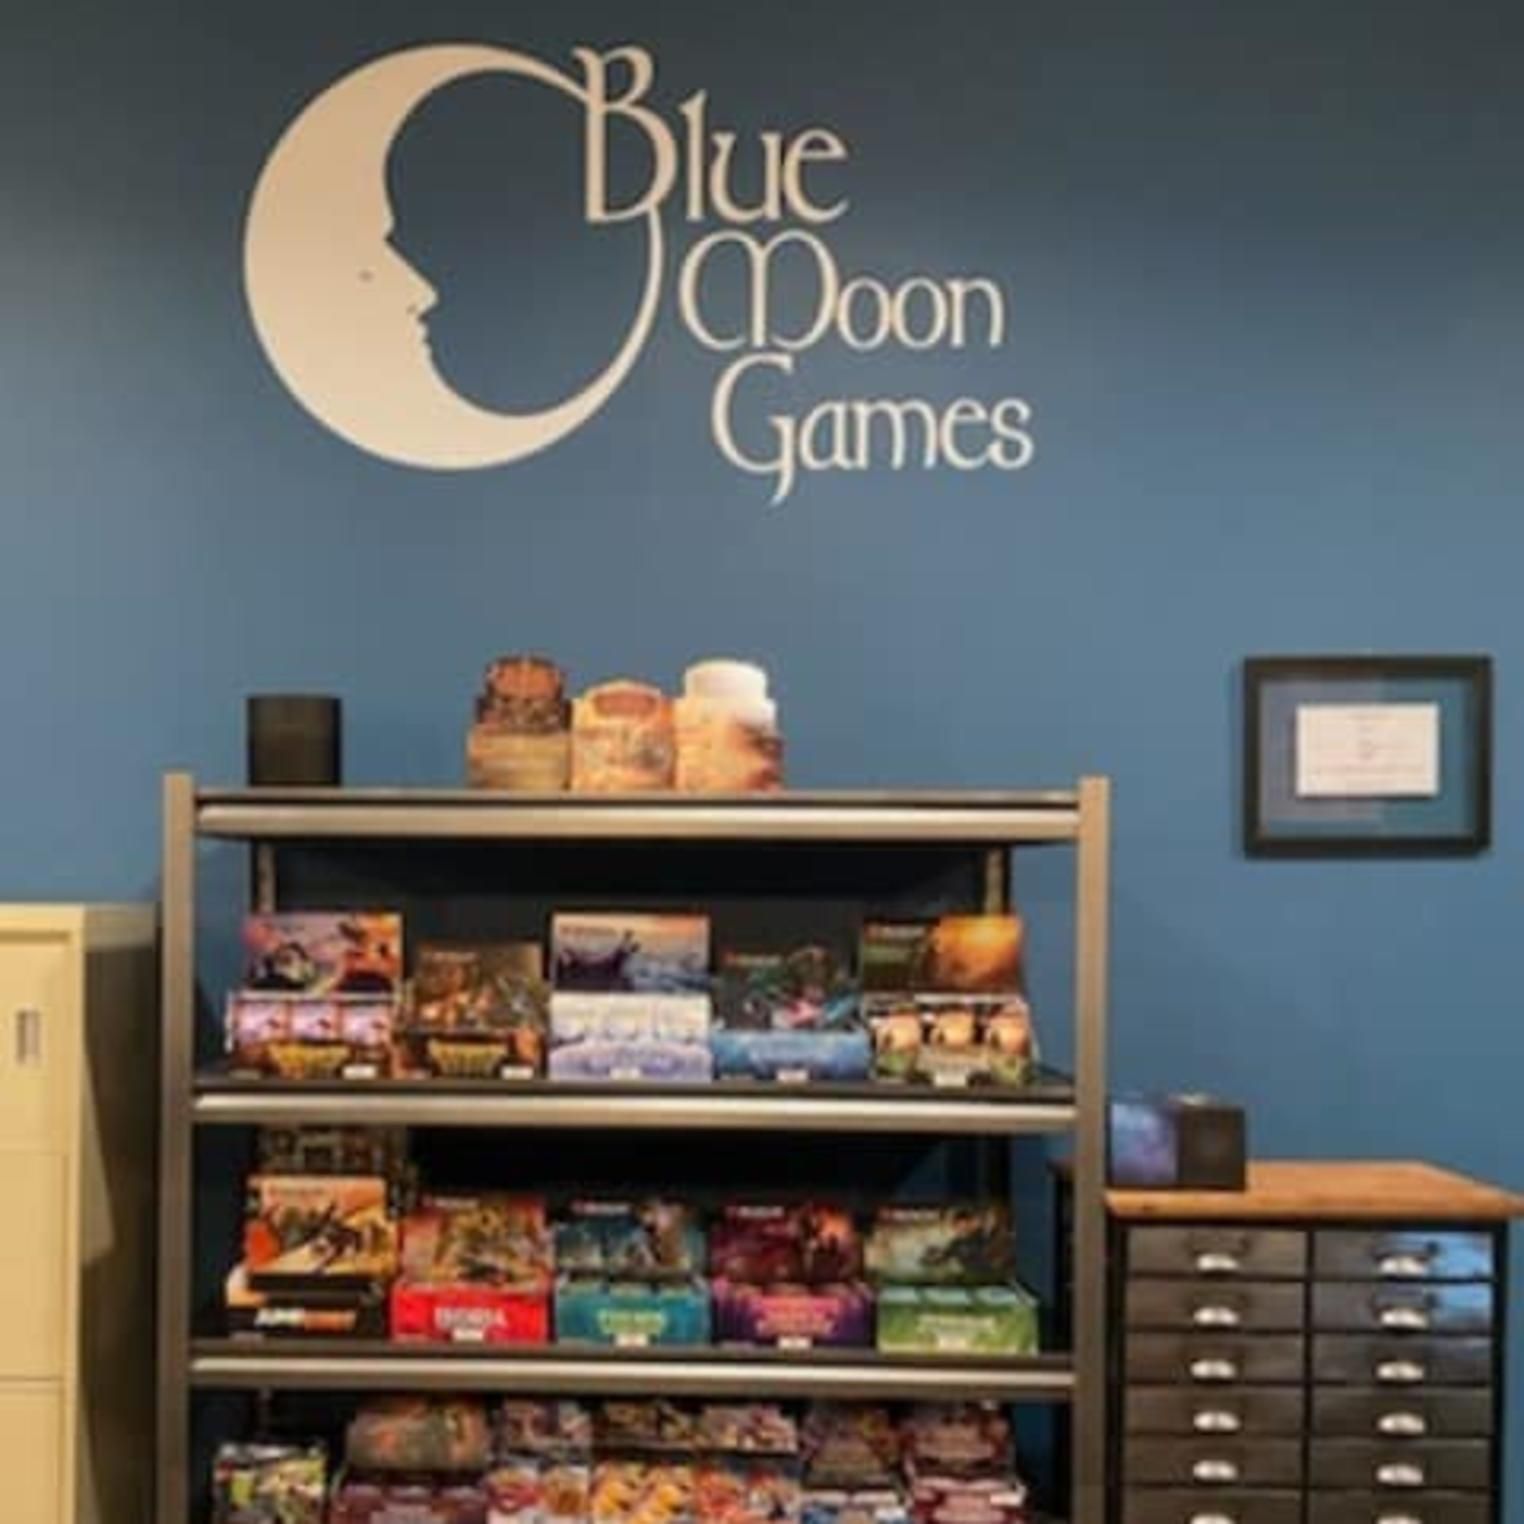 Blue Moon Games